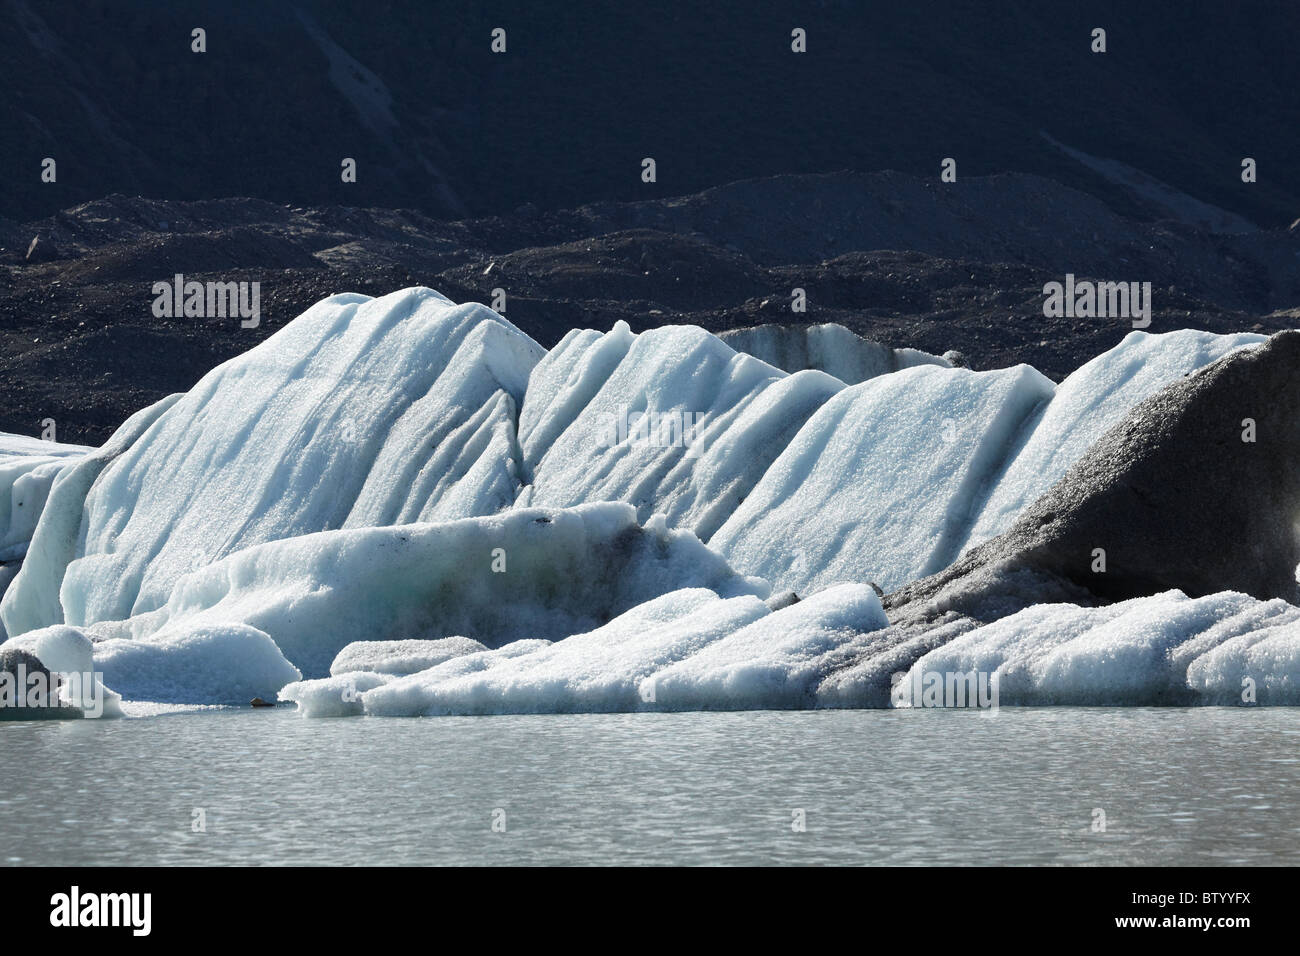 Icebergs in Tasman Glacier Terminal Lake, Aoraki / Mt Cook National Park, Canterbury, South Island, New Zealand Stock Photo